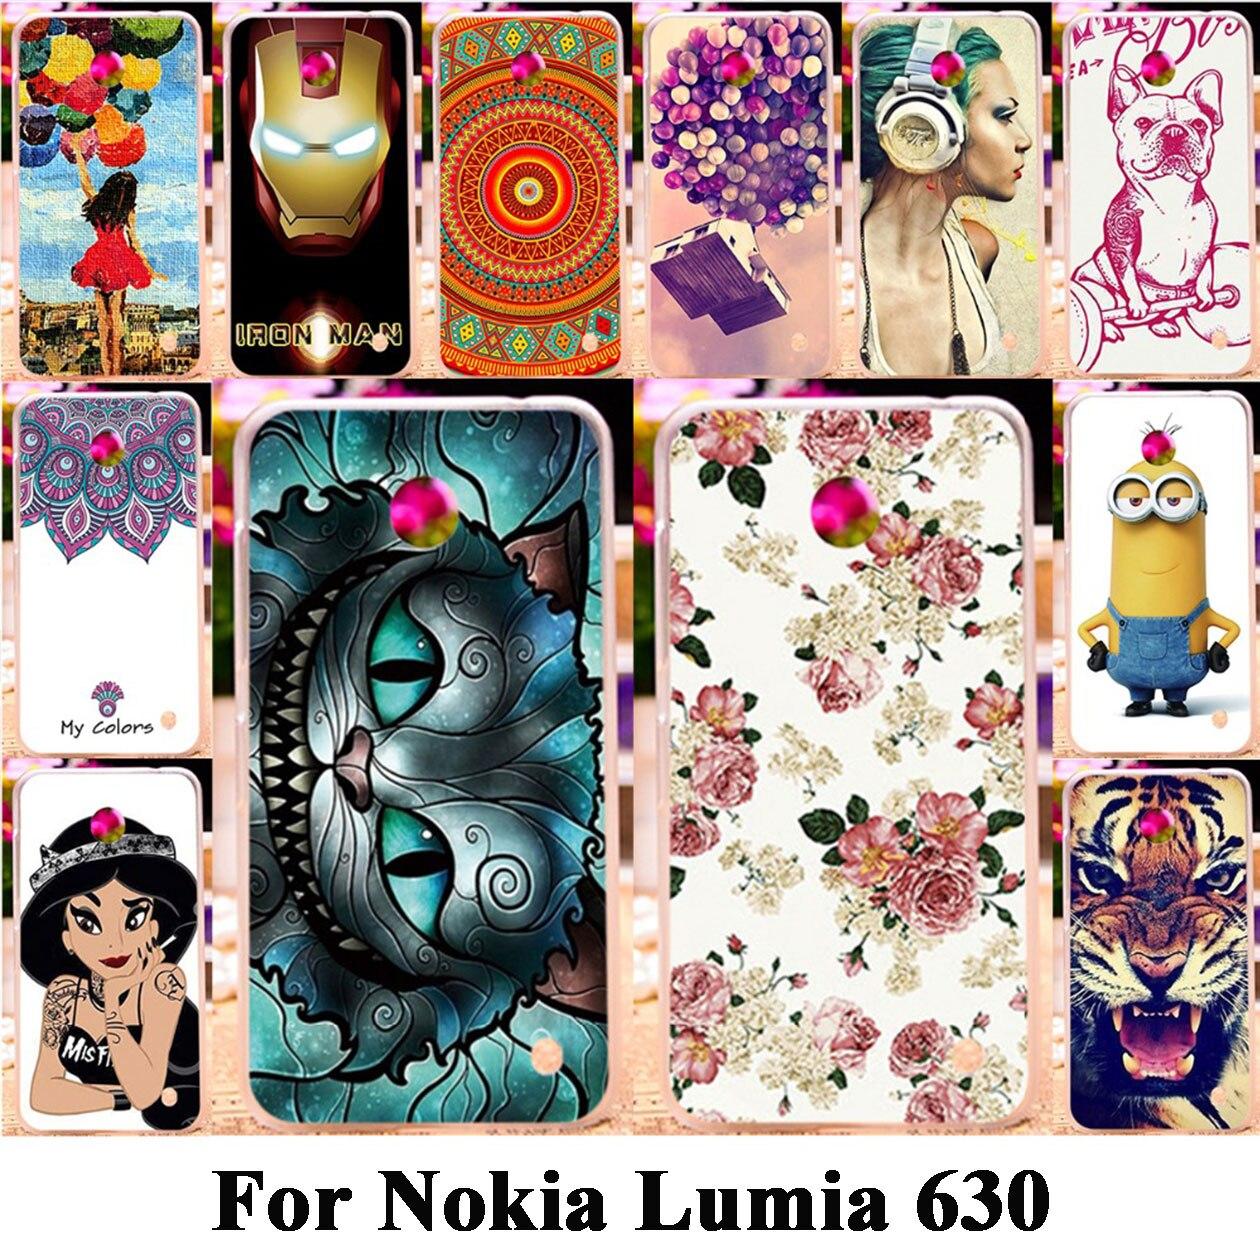 AKABEILA Phone Cases For Nokia Lumia 630 Housing Cover DS Dual SIM RM-978 N630 3G RM-976 Soft TPU Hard PC Bag For Lumia 630